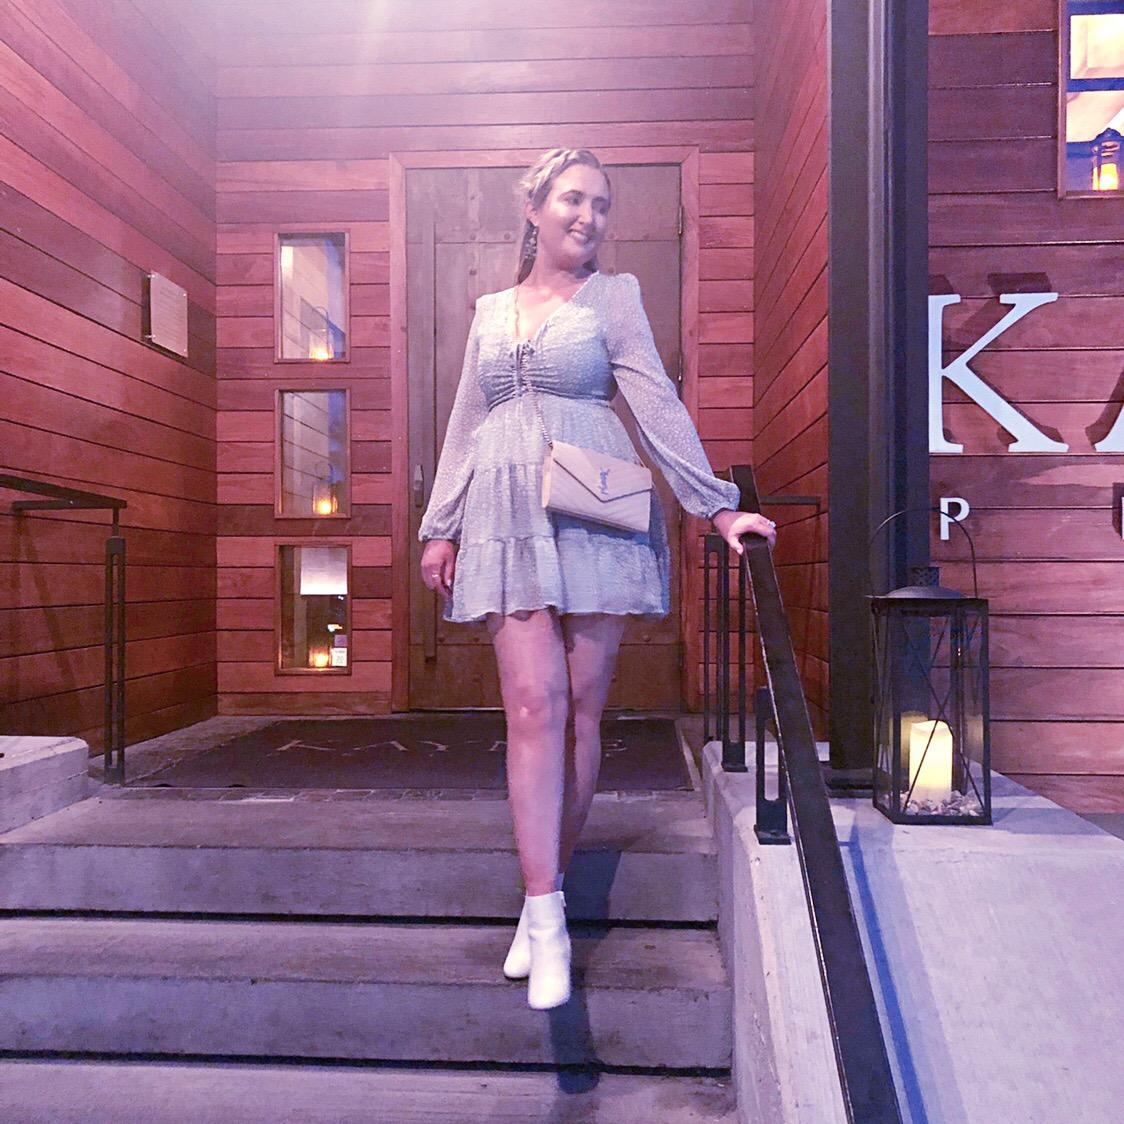 nashivlle style, nashville look, white booties, princess polly long sleeve dress, saint laurent handbag